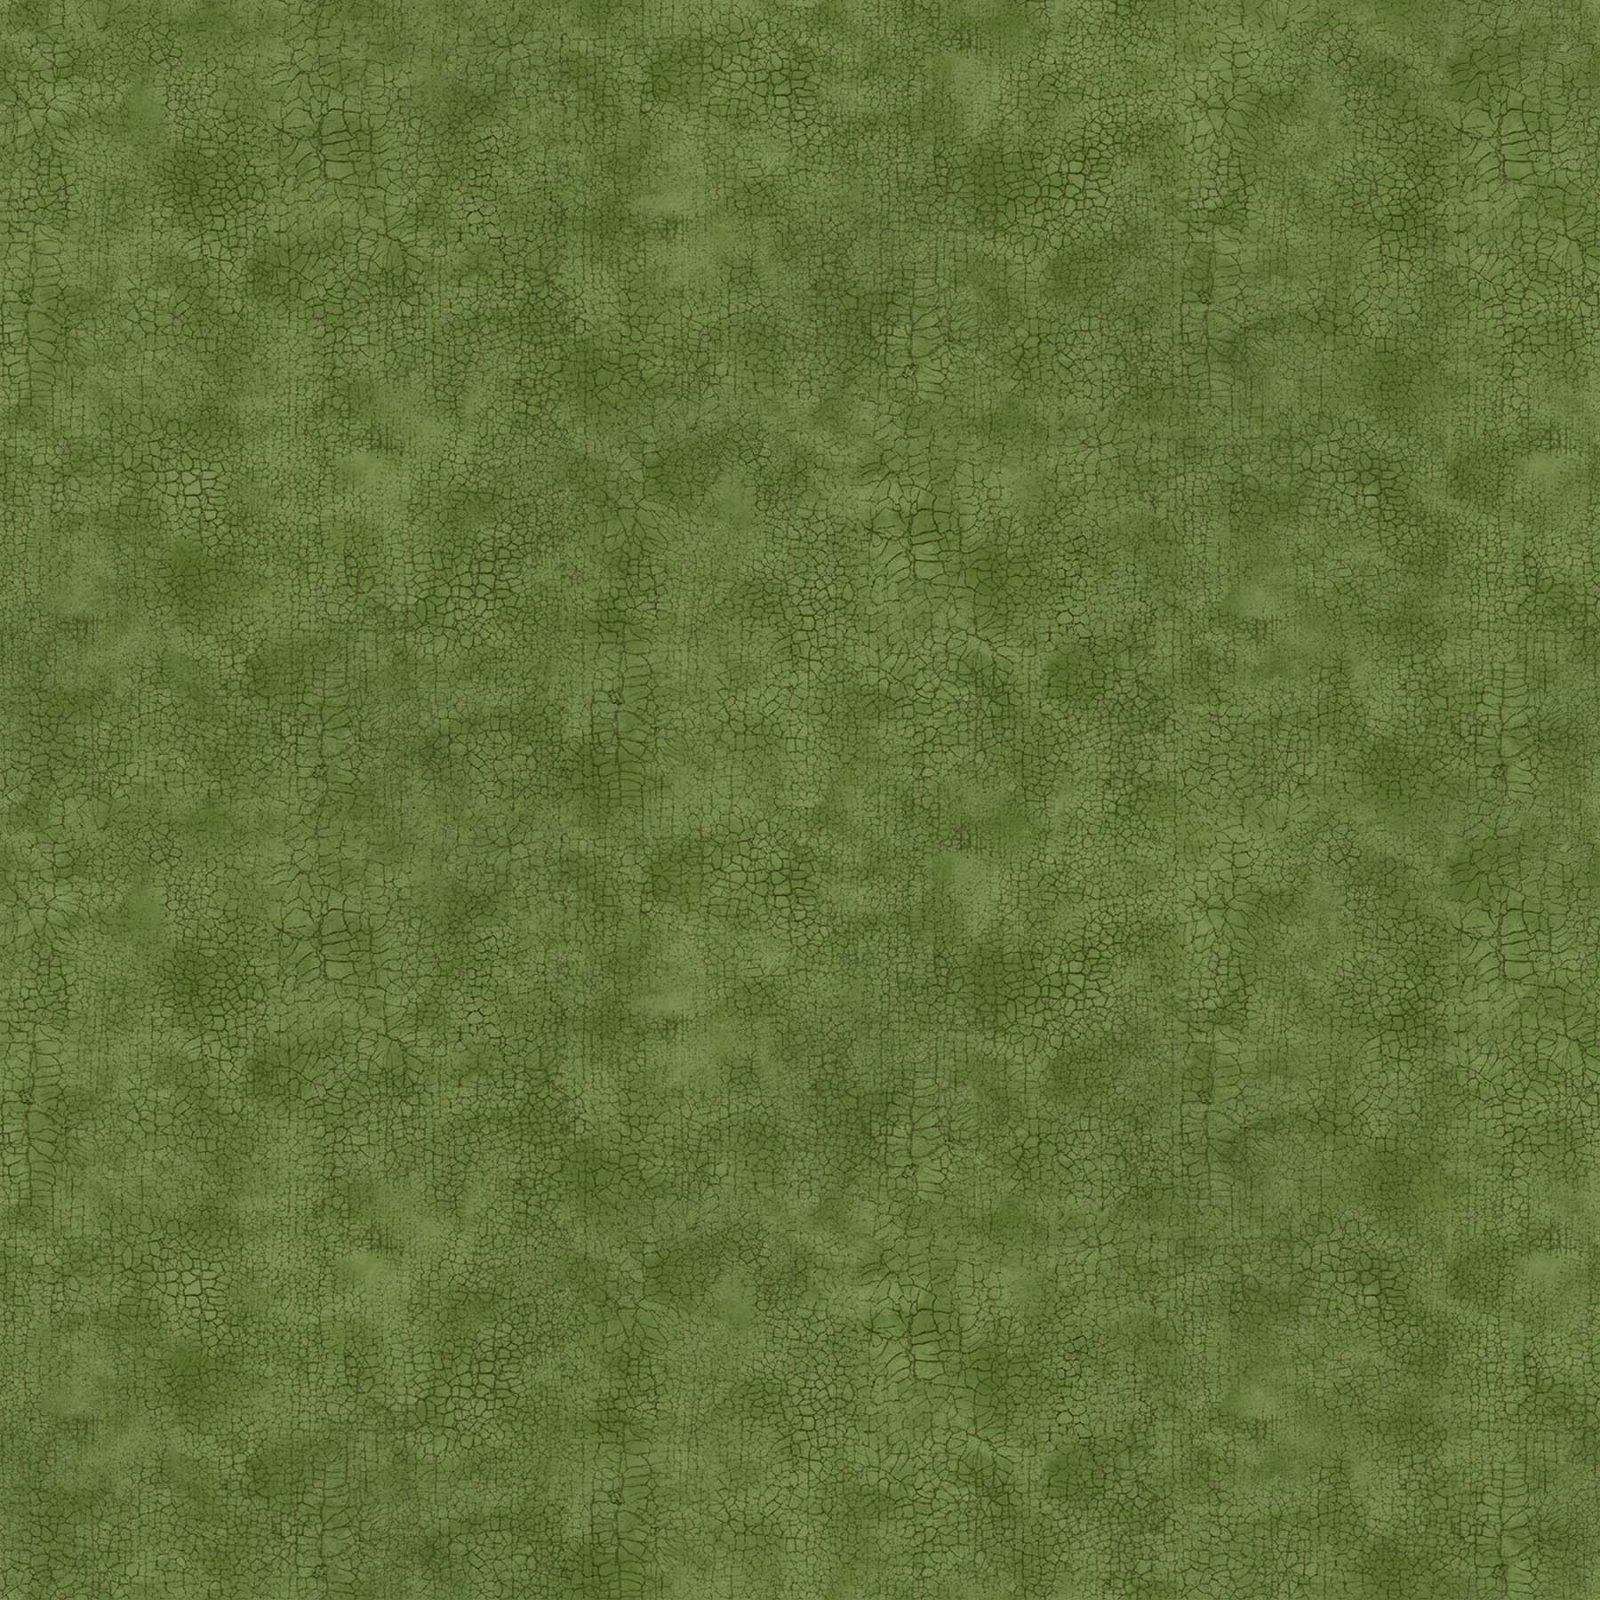 F-N-9045 78 Pine Needle Crackle